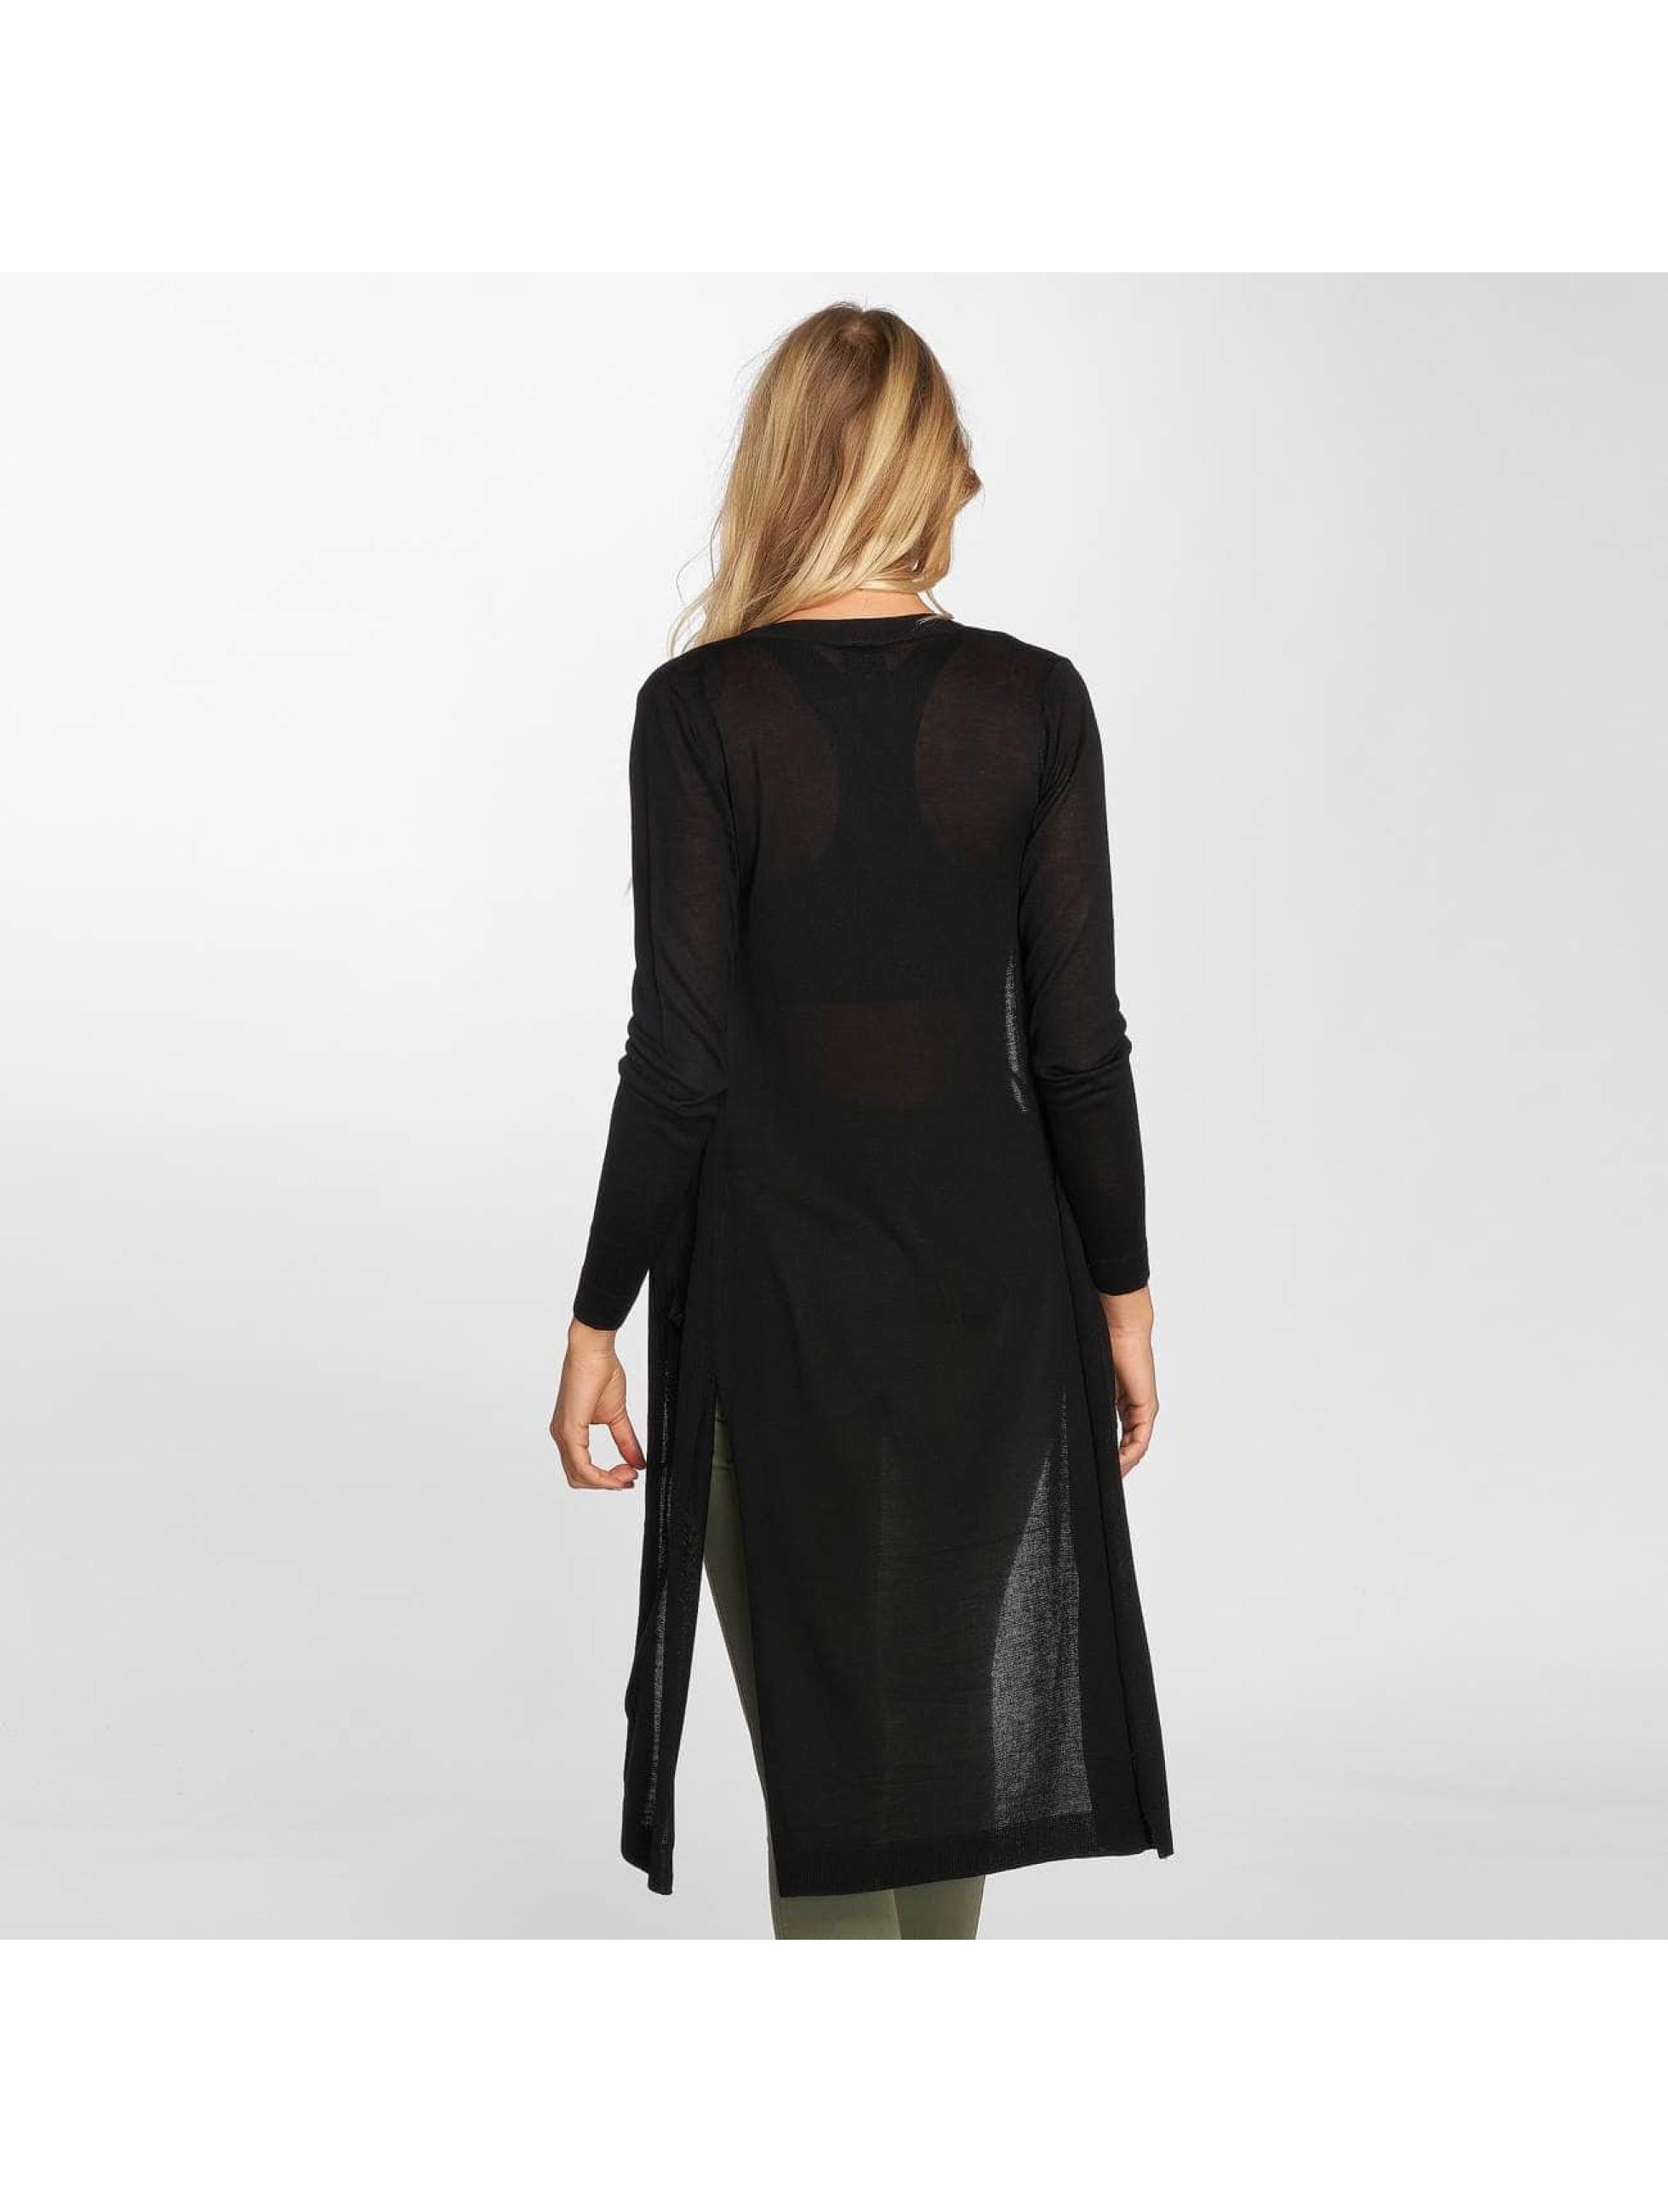 Urban Classics Кардиган Ladies Fine Knit черный